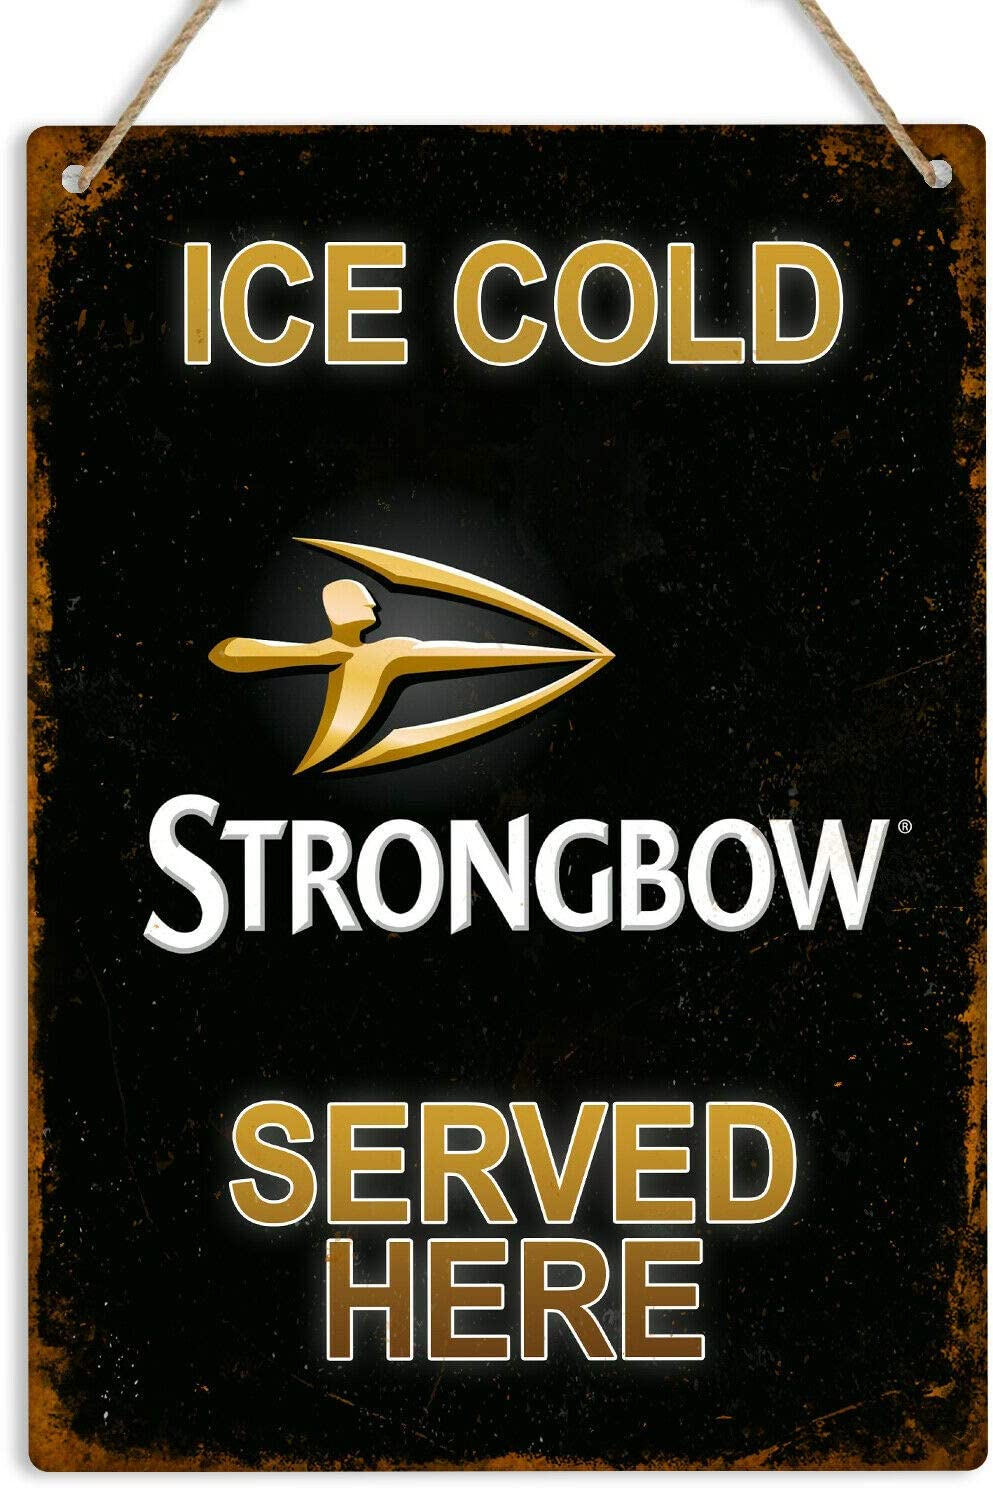 Strongbow cider pub bar home decor man cave art metal wall sign plaque HOME BAR